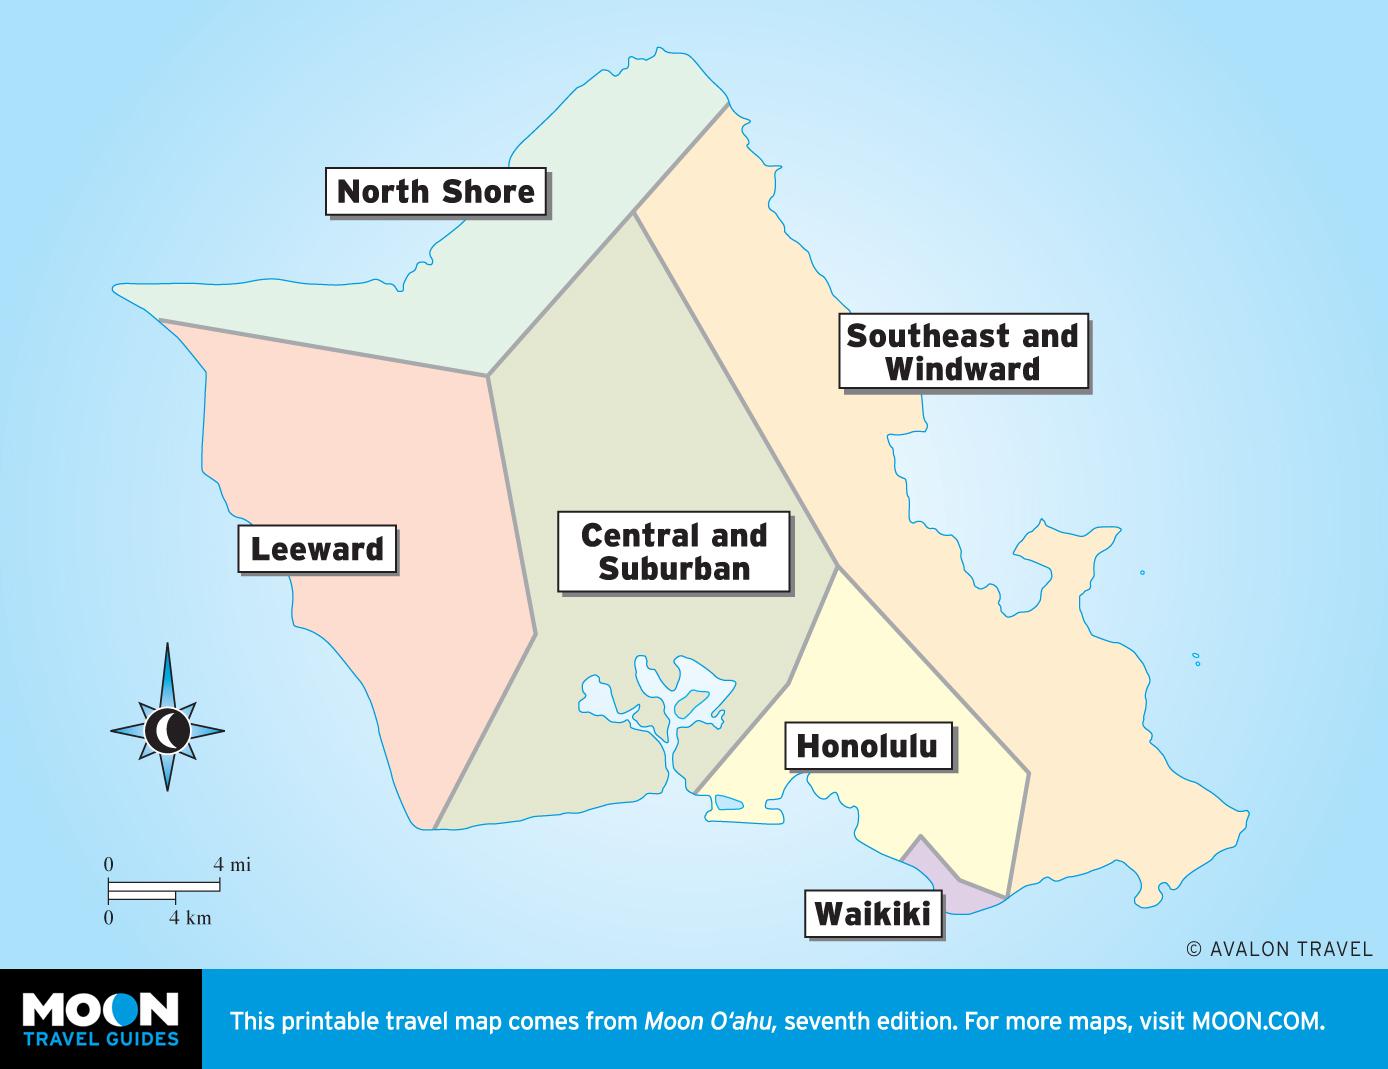 photo regarding Oahu Map Printable called Oahu Avalon Drive